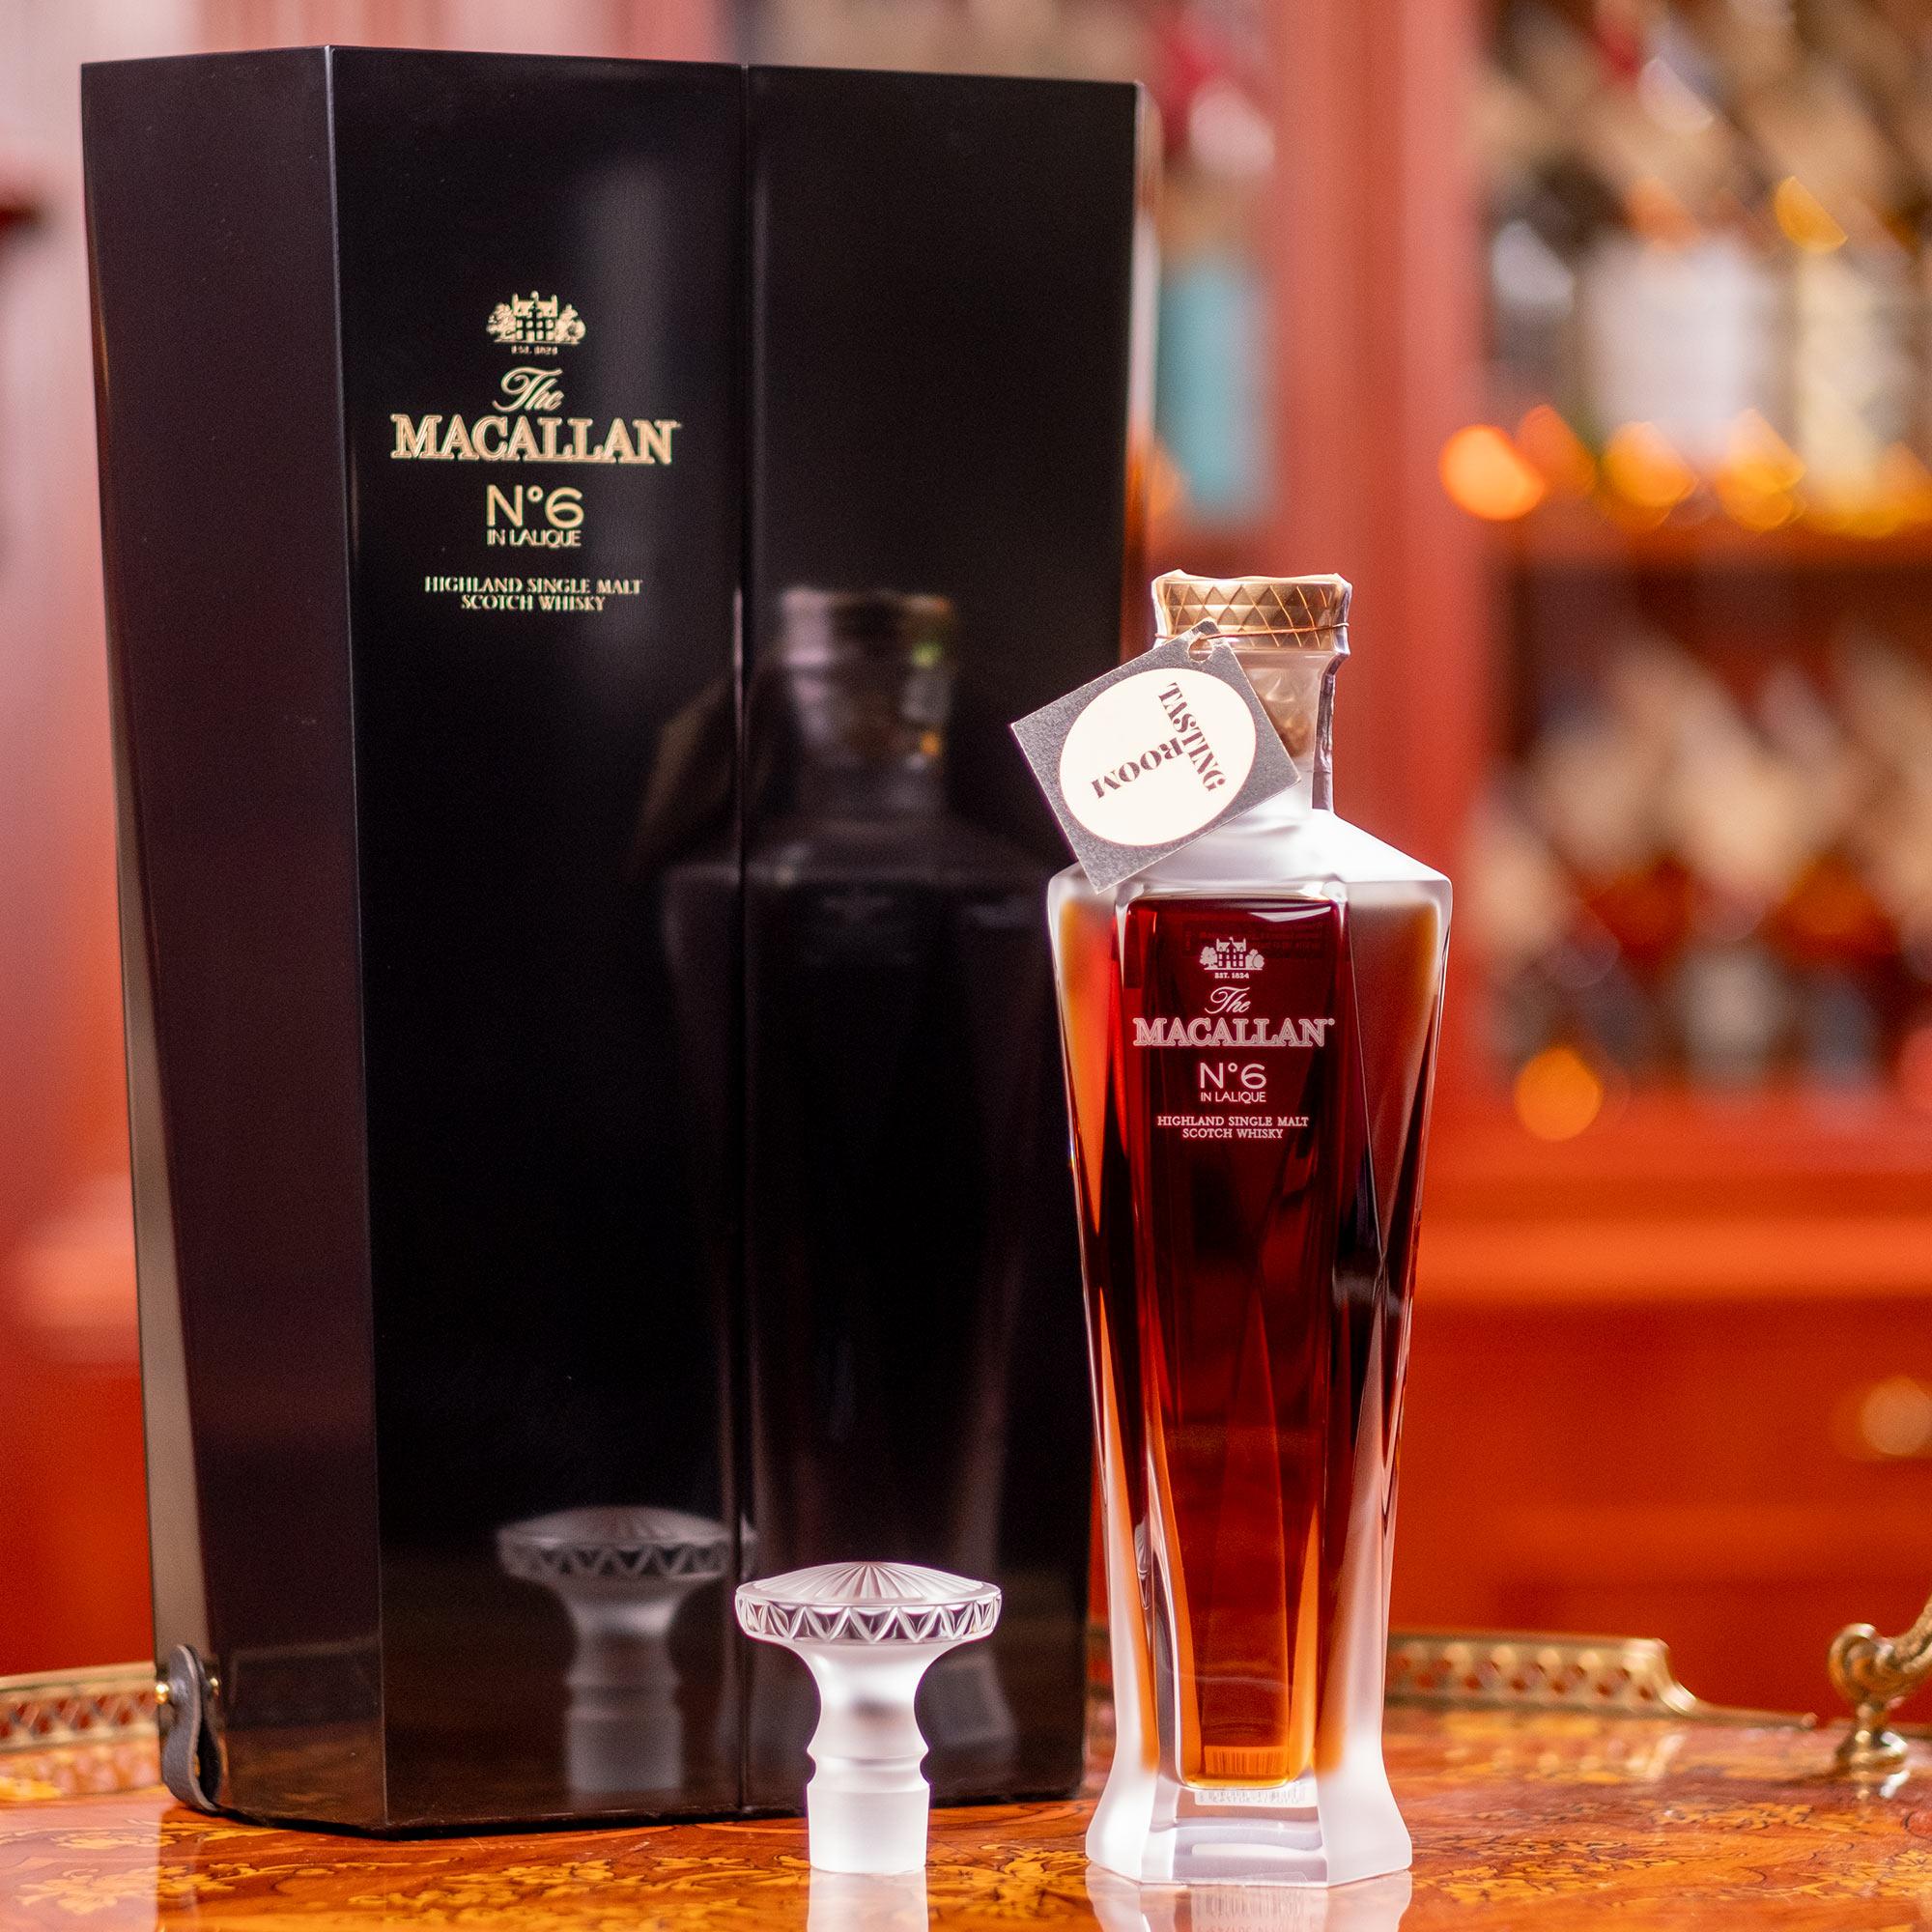 The Macallan Number 6 Decanter /Макалан Номер 6 Декантер